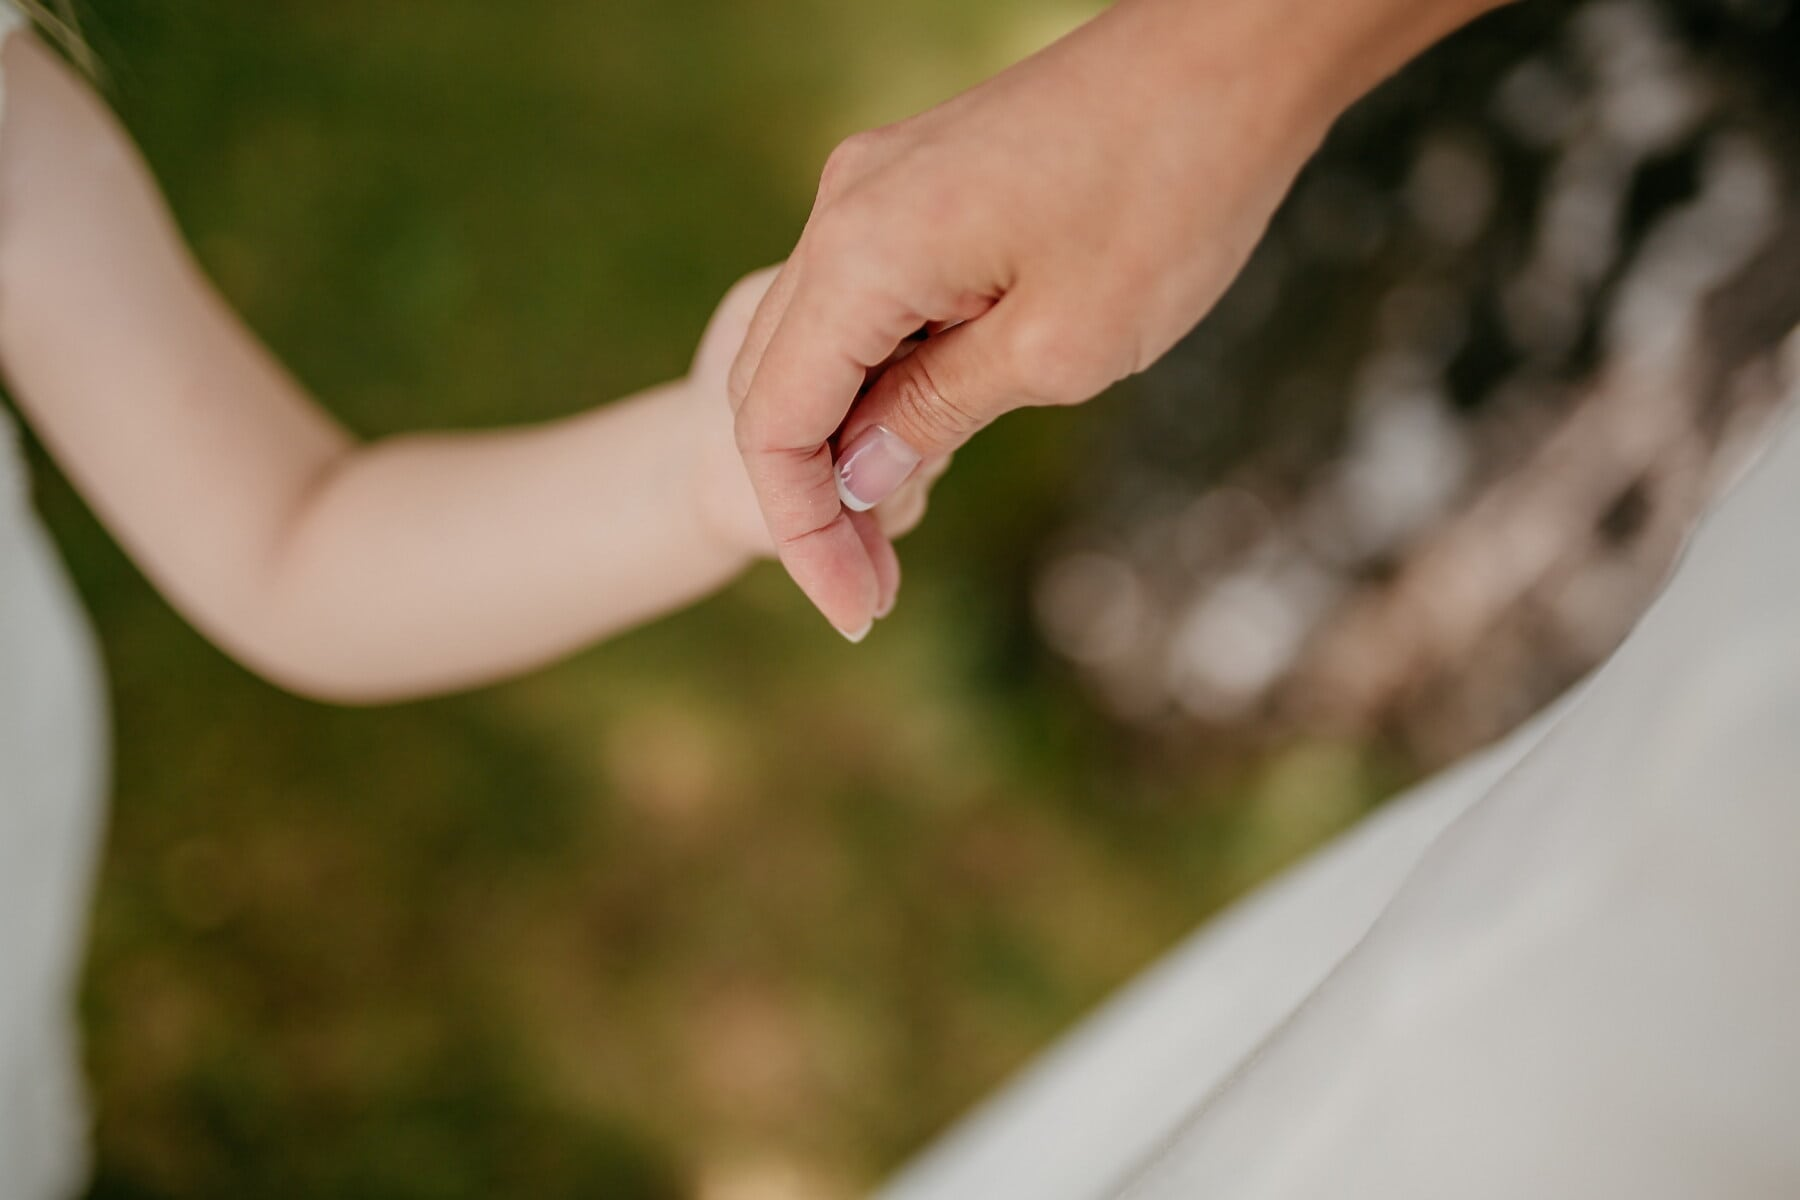 holding hands, hands, motherhood, finger, mother, touch, daughter, family, love, trust